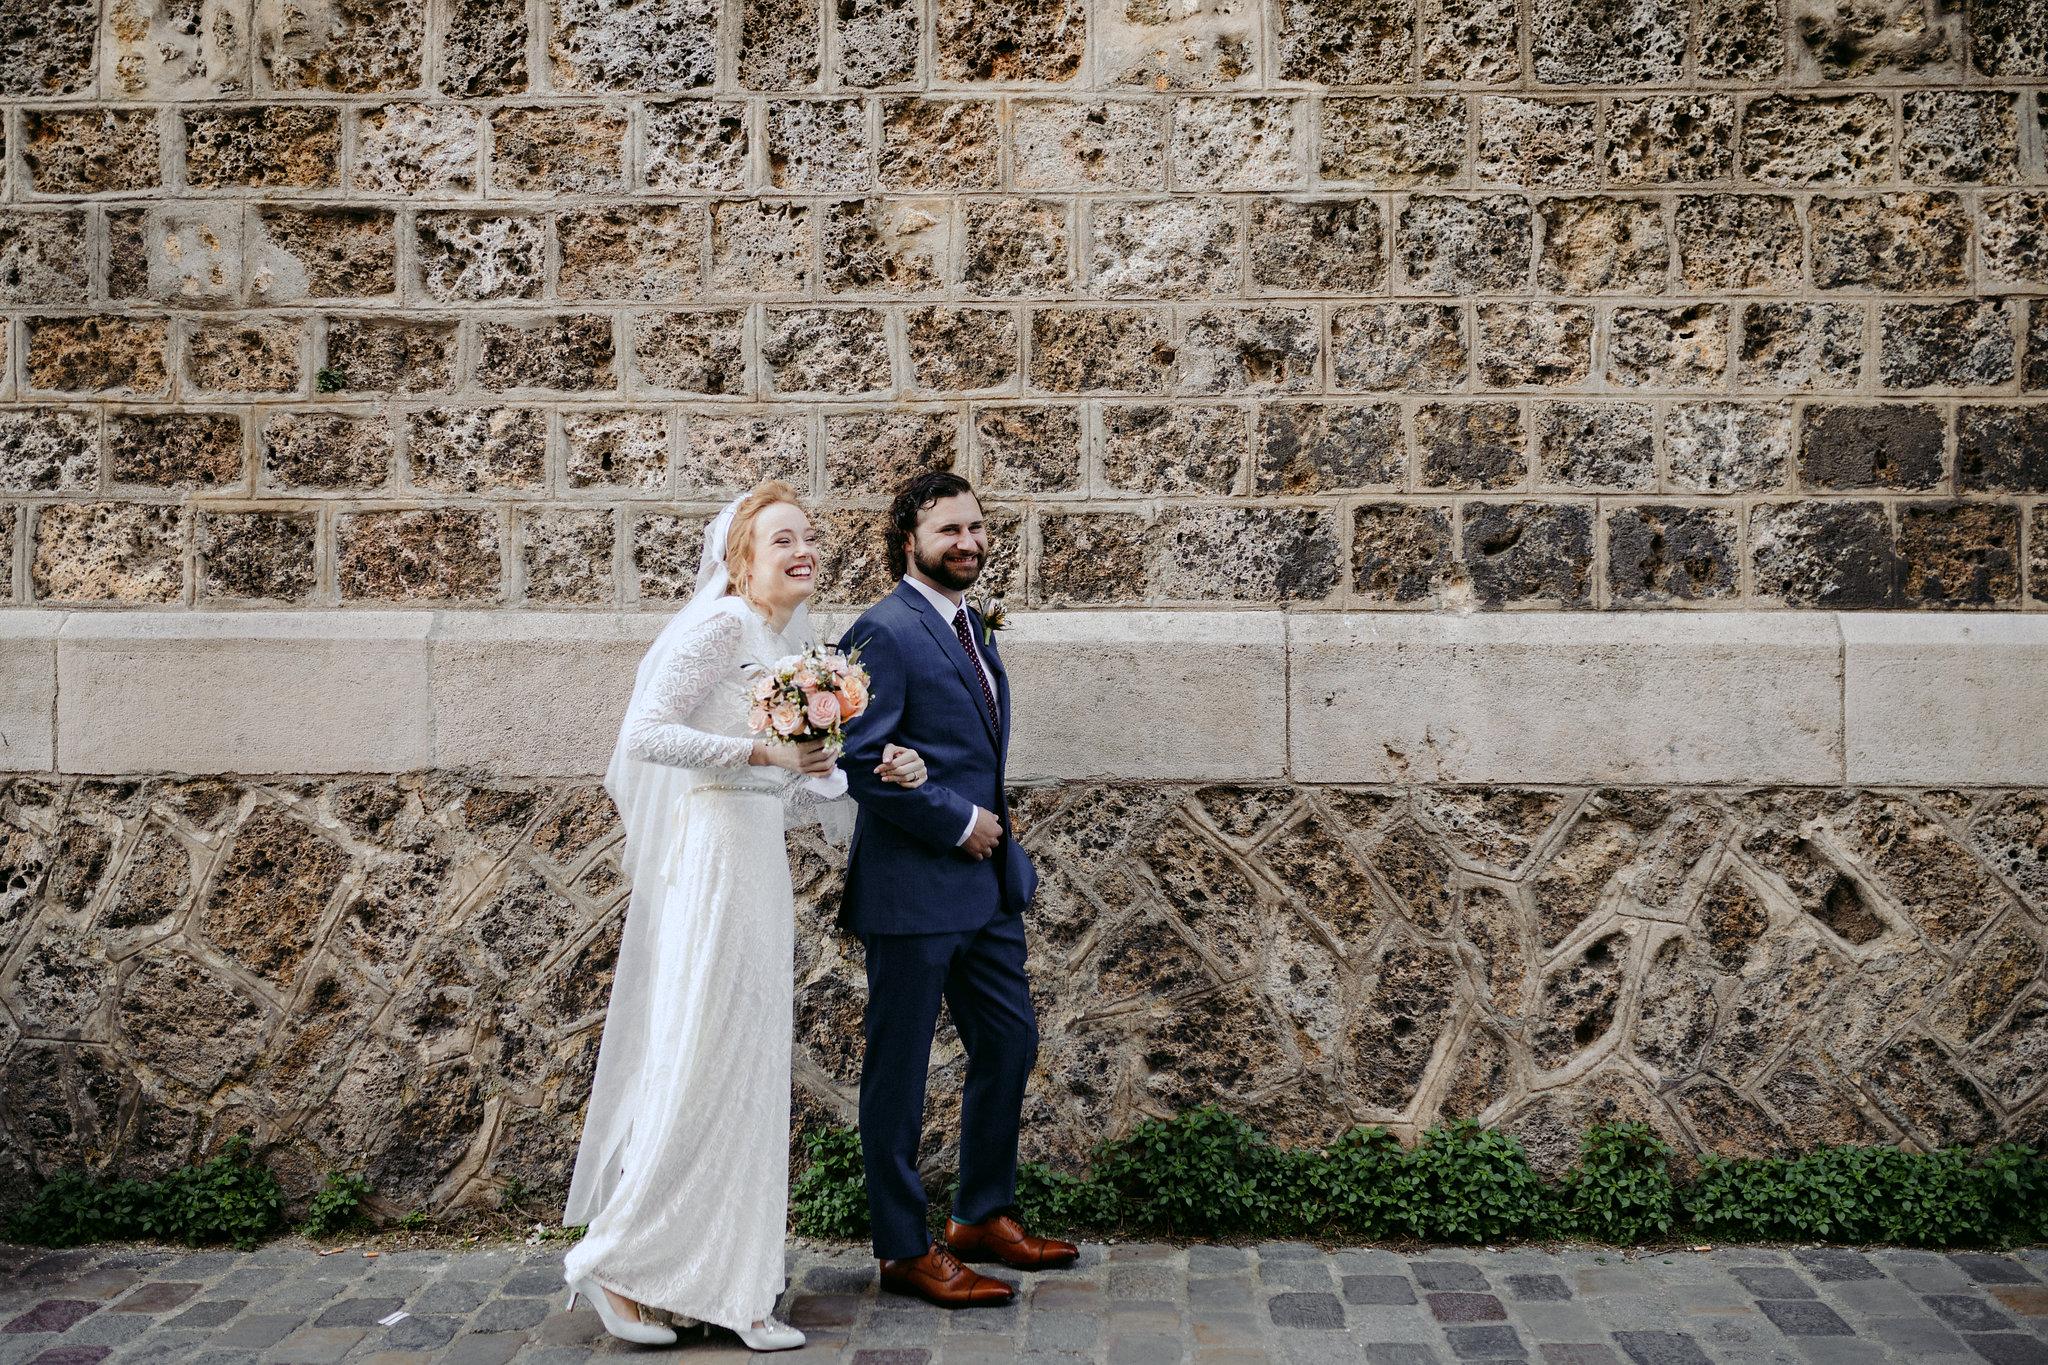 Paris_elopement_wedding_photographer-133.jpg